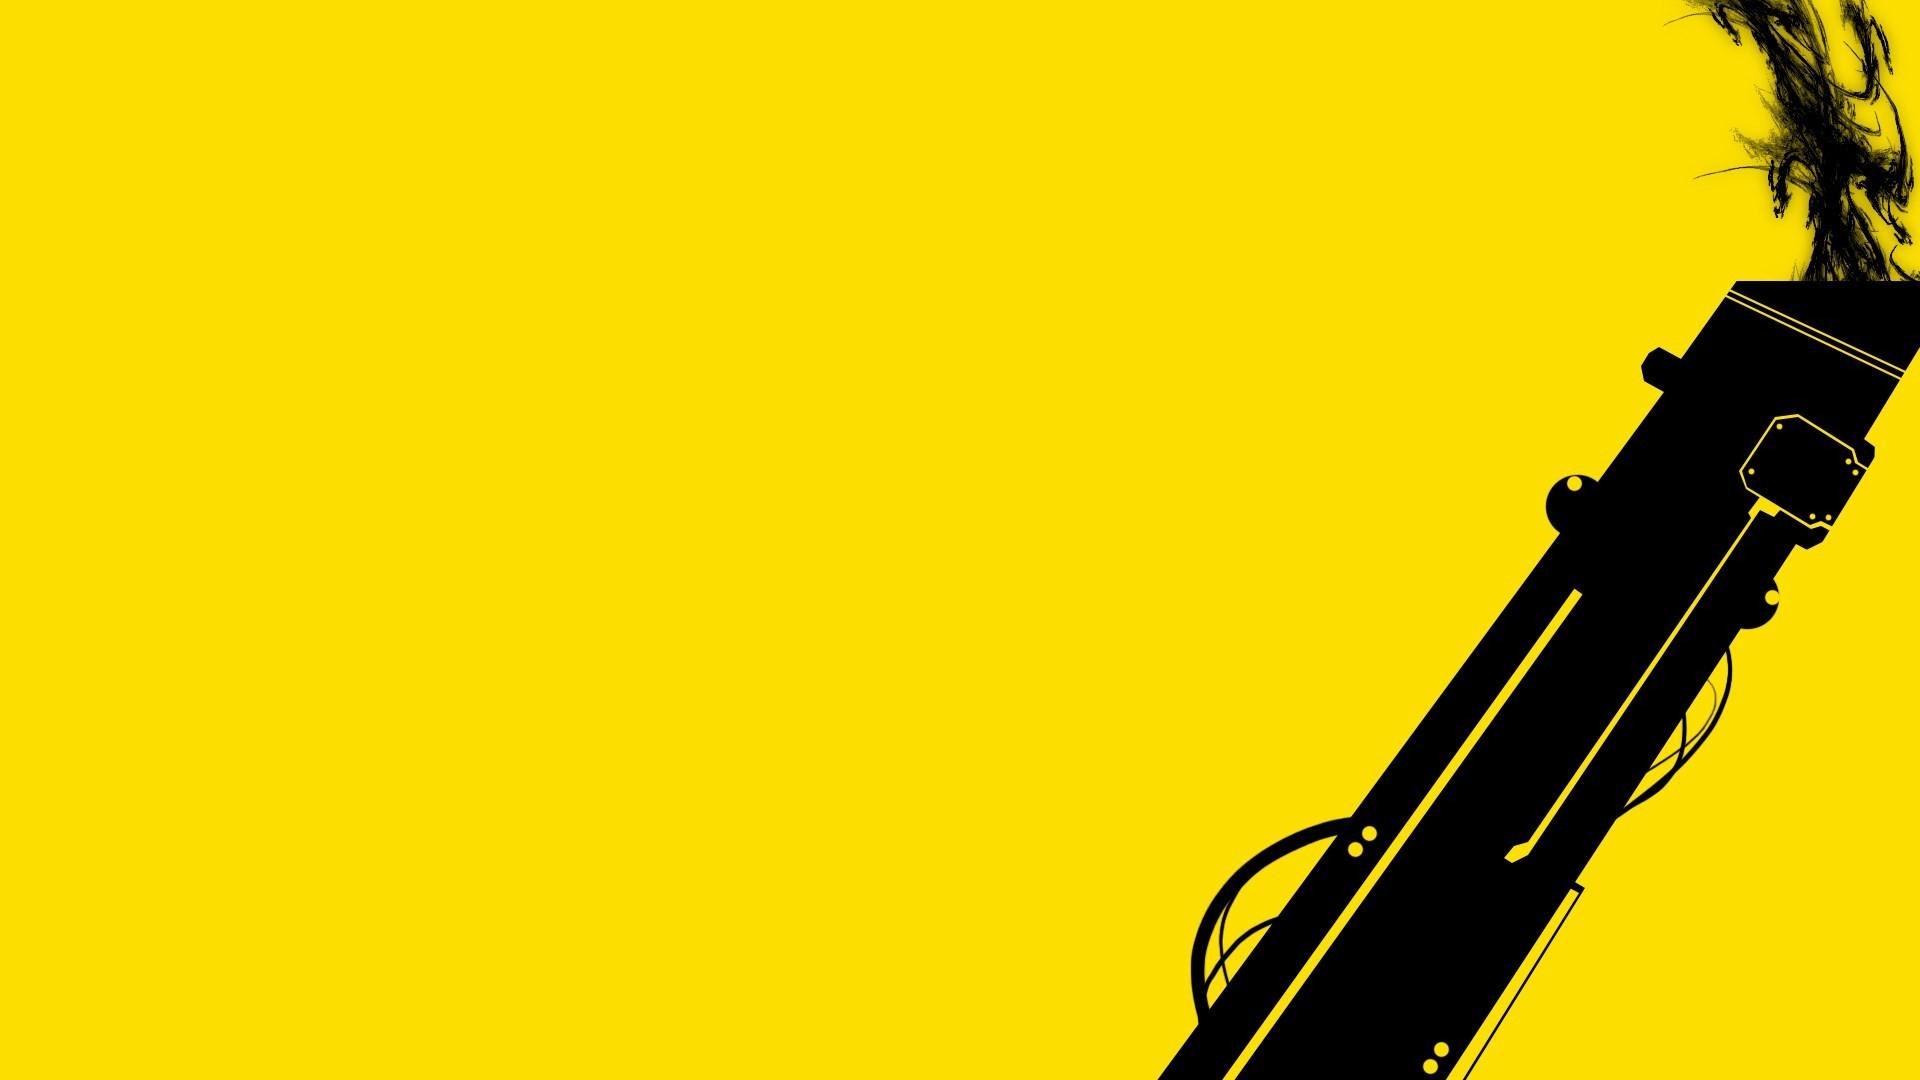 black gun on yellow background wallpaper pc